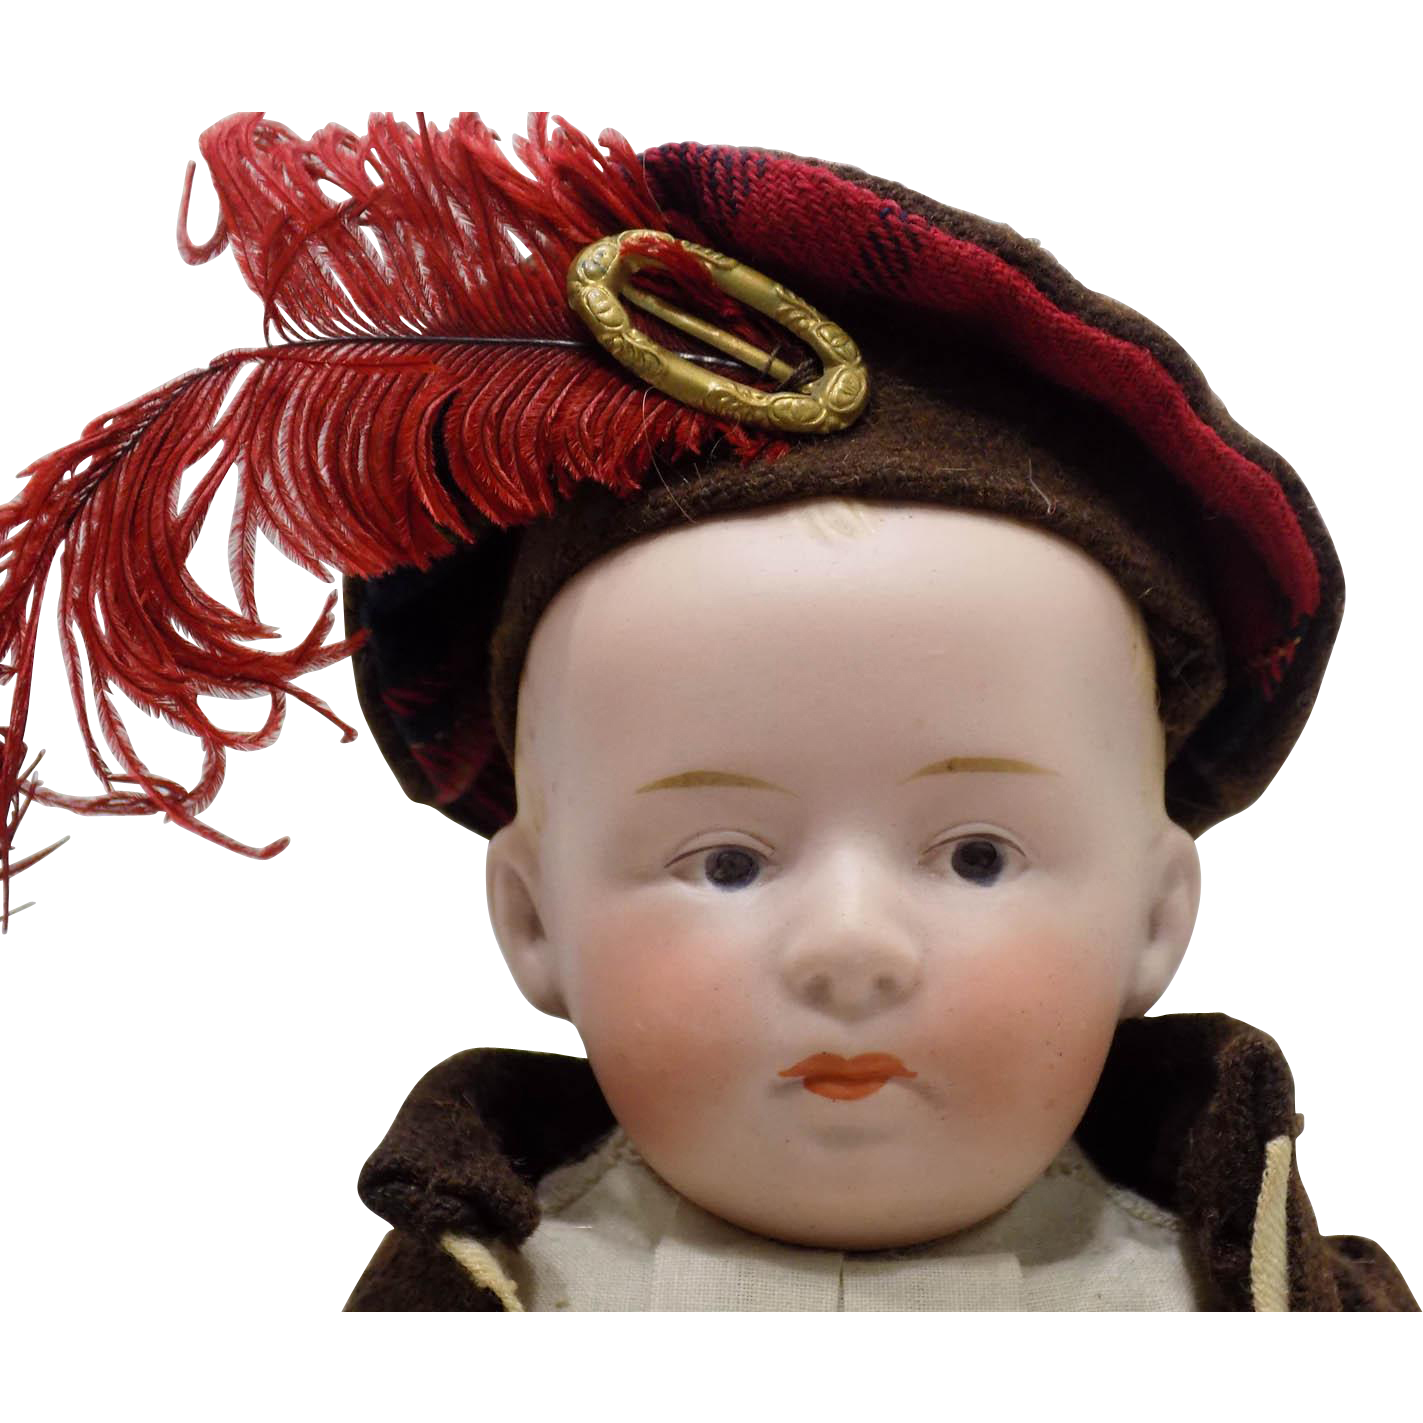 Antique German Heubach Pouty Mouth Doll Original Clothes